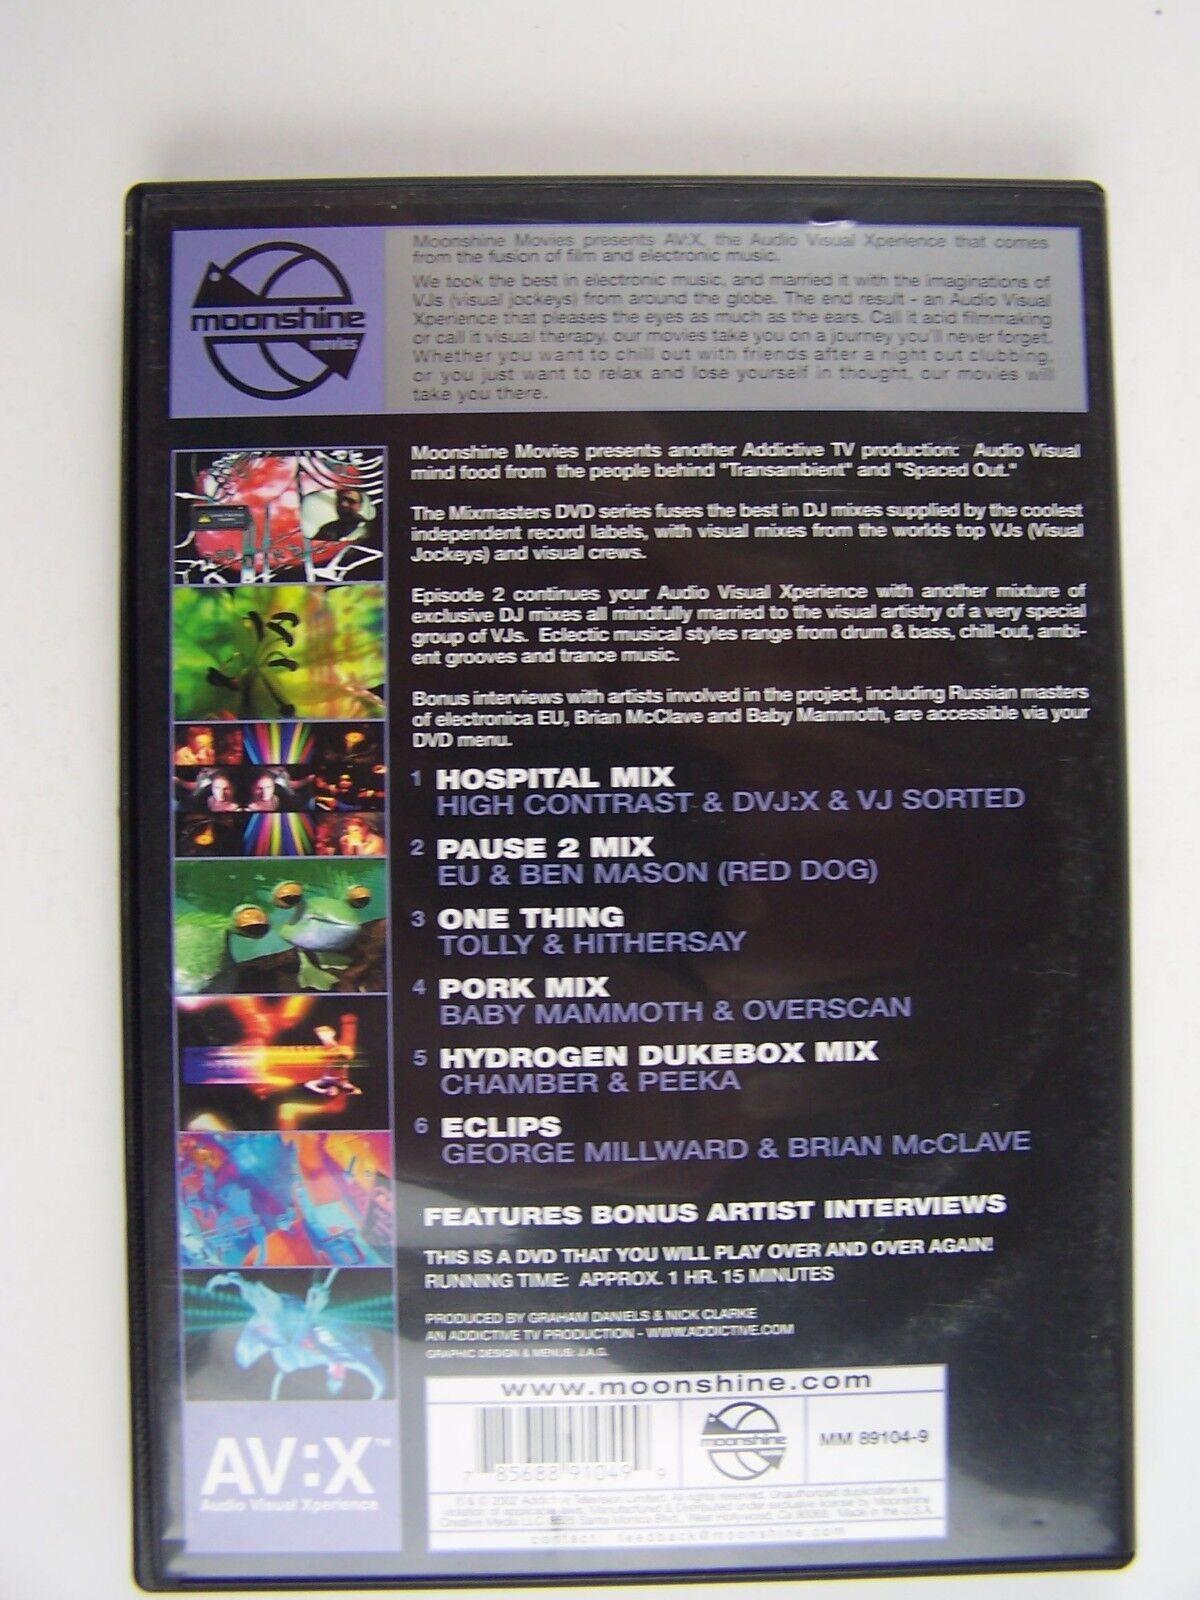 Moonshine Movies Presents AV:X.04 - Mixmasters Episode